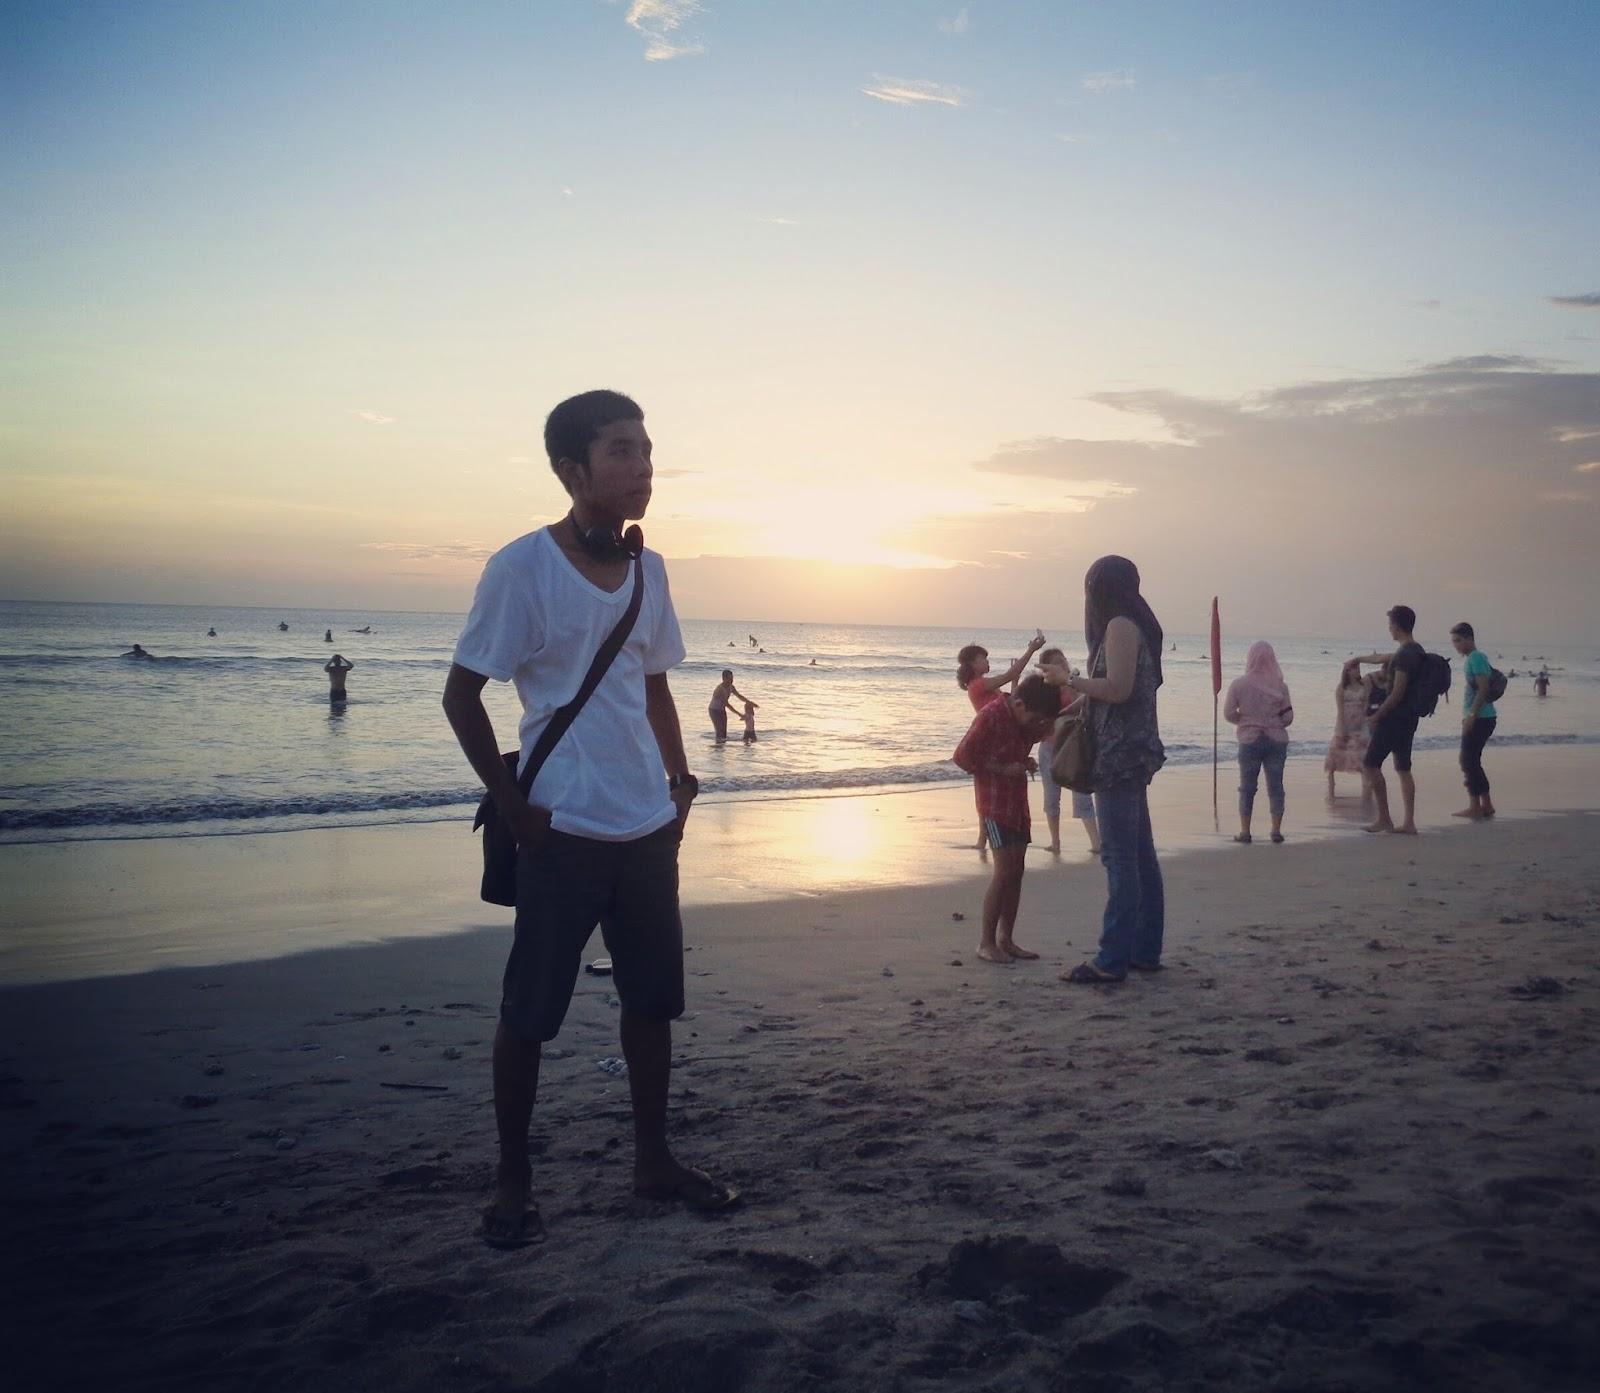 Tengket Beach Maneron 10 Wisata Pantai Madura Sekitar Rp 1